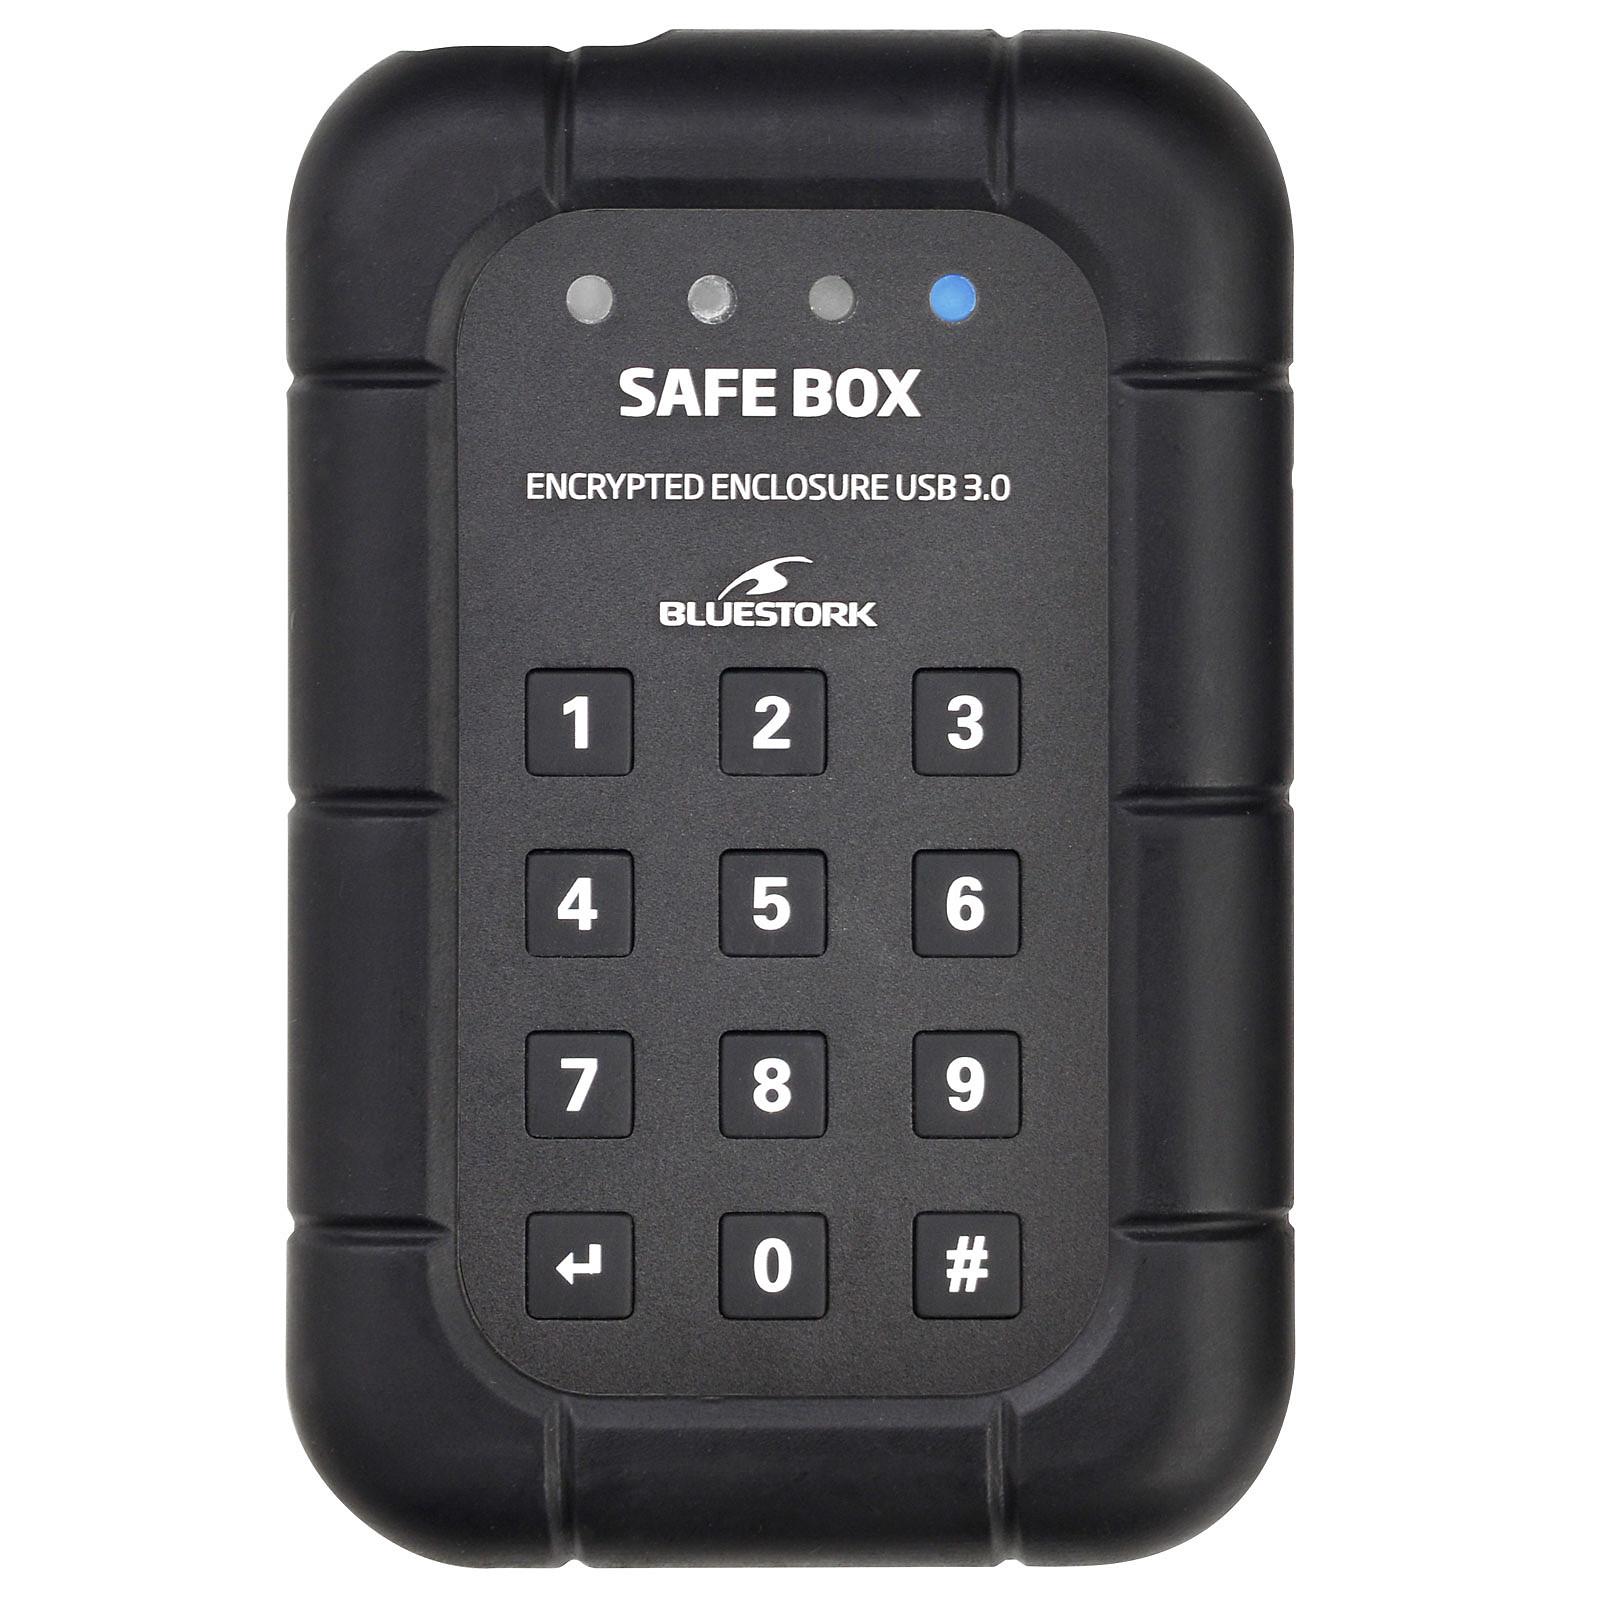 Bluestork Safe Box